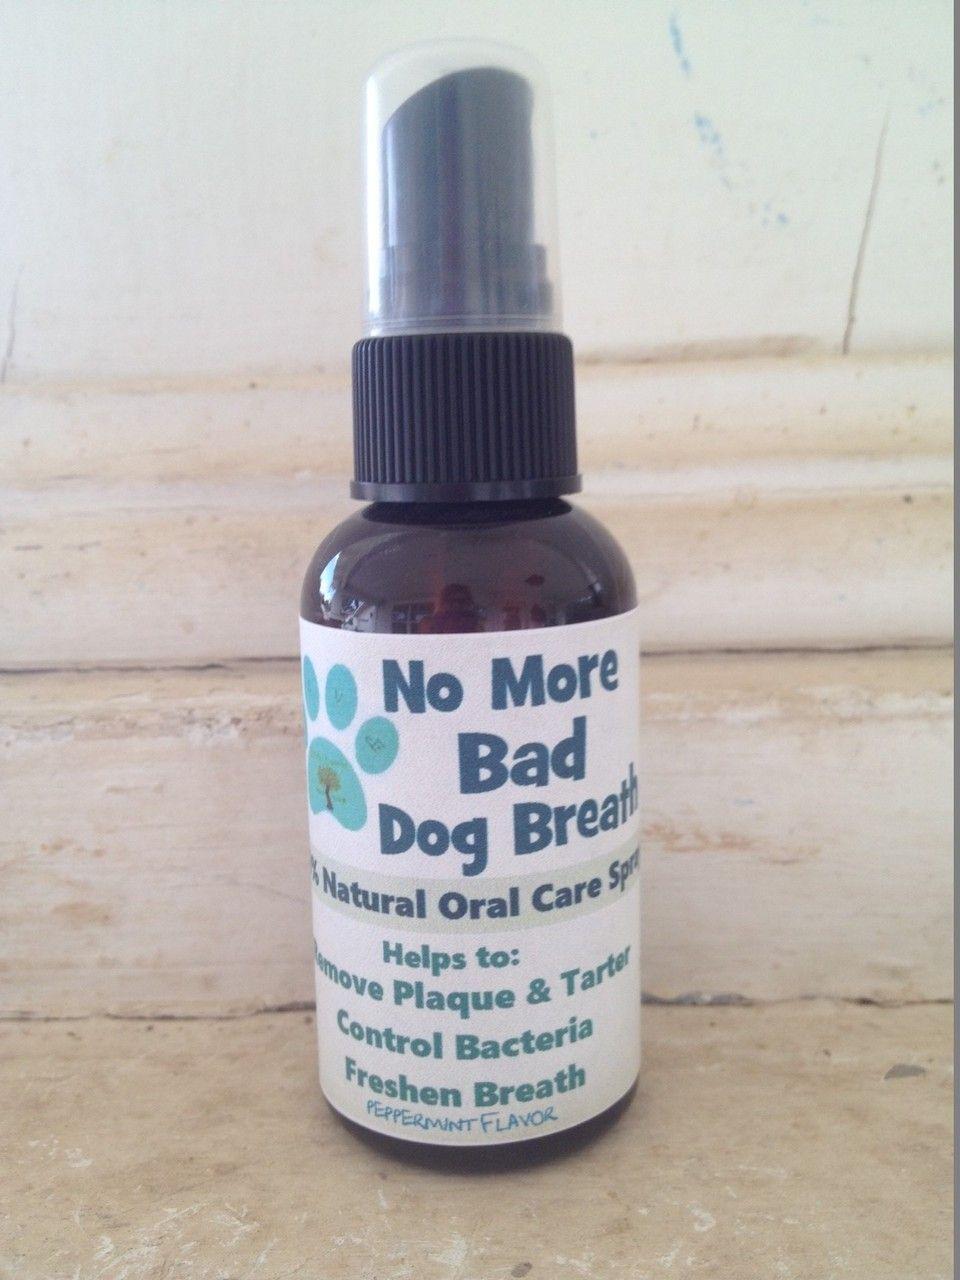 No More Bad Dog Breath Tarter, Plaque Control White Teeth